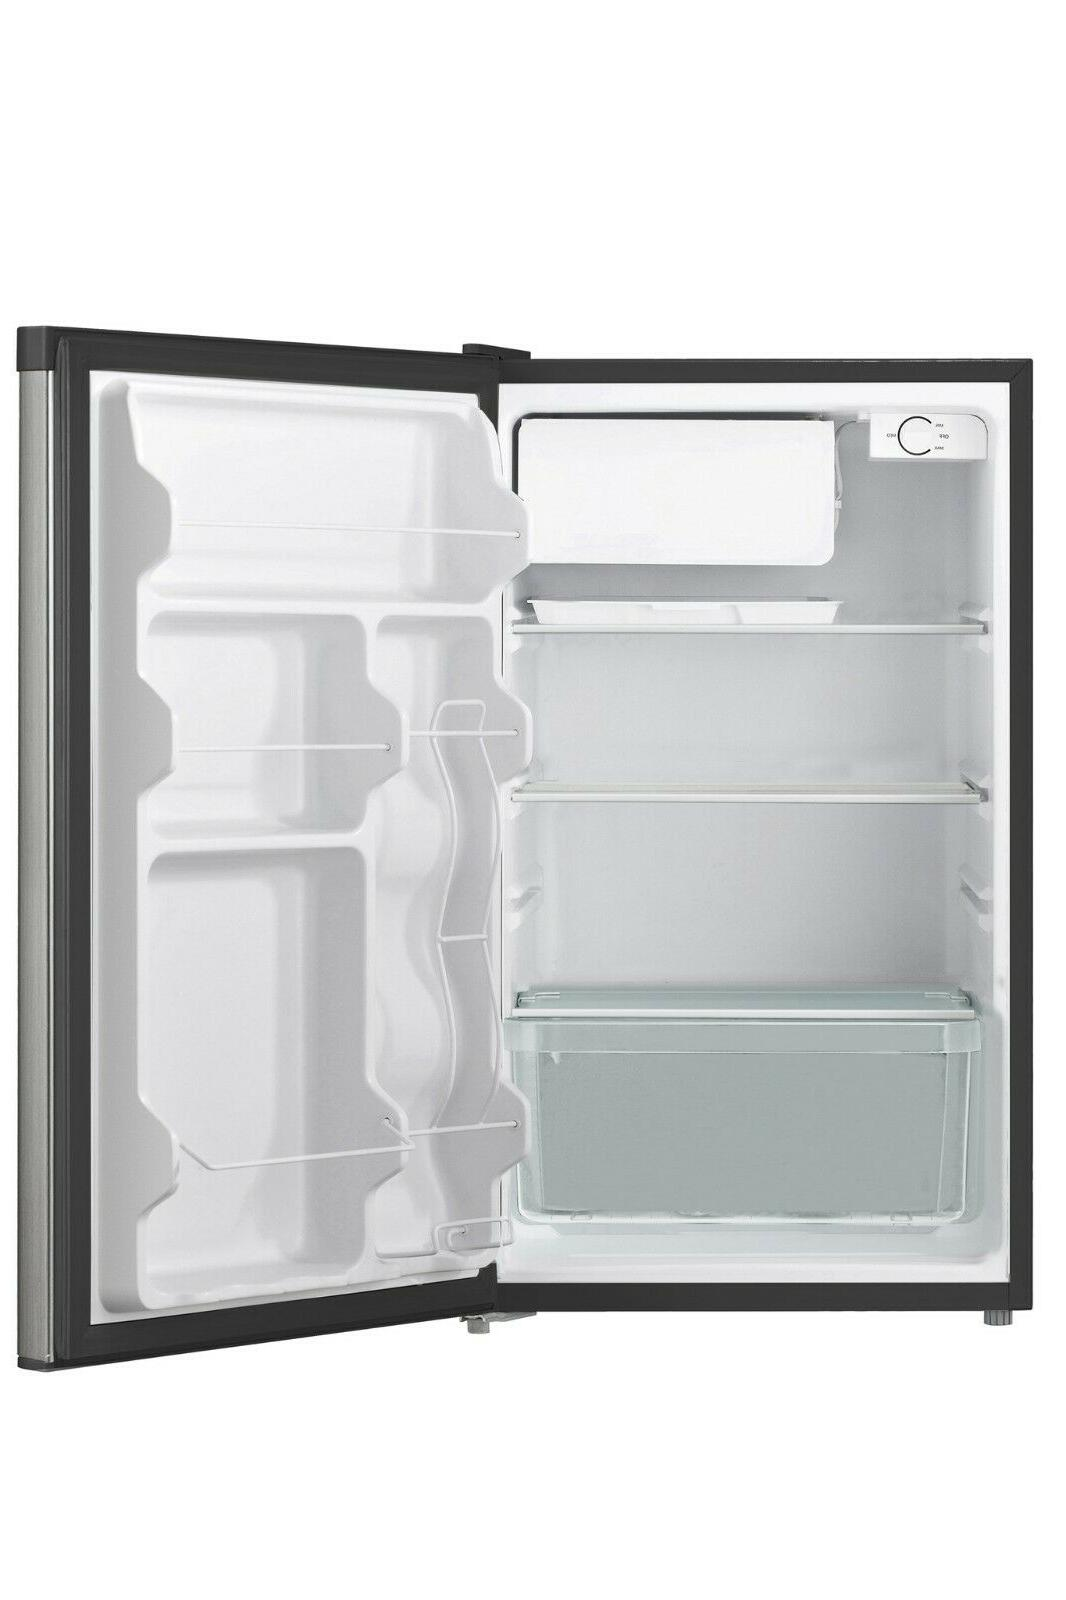 4.4 Ft Fridge Compact Refrigerator Chiller